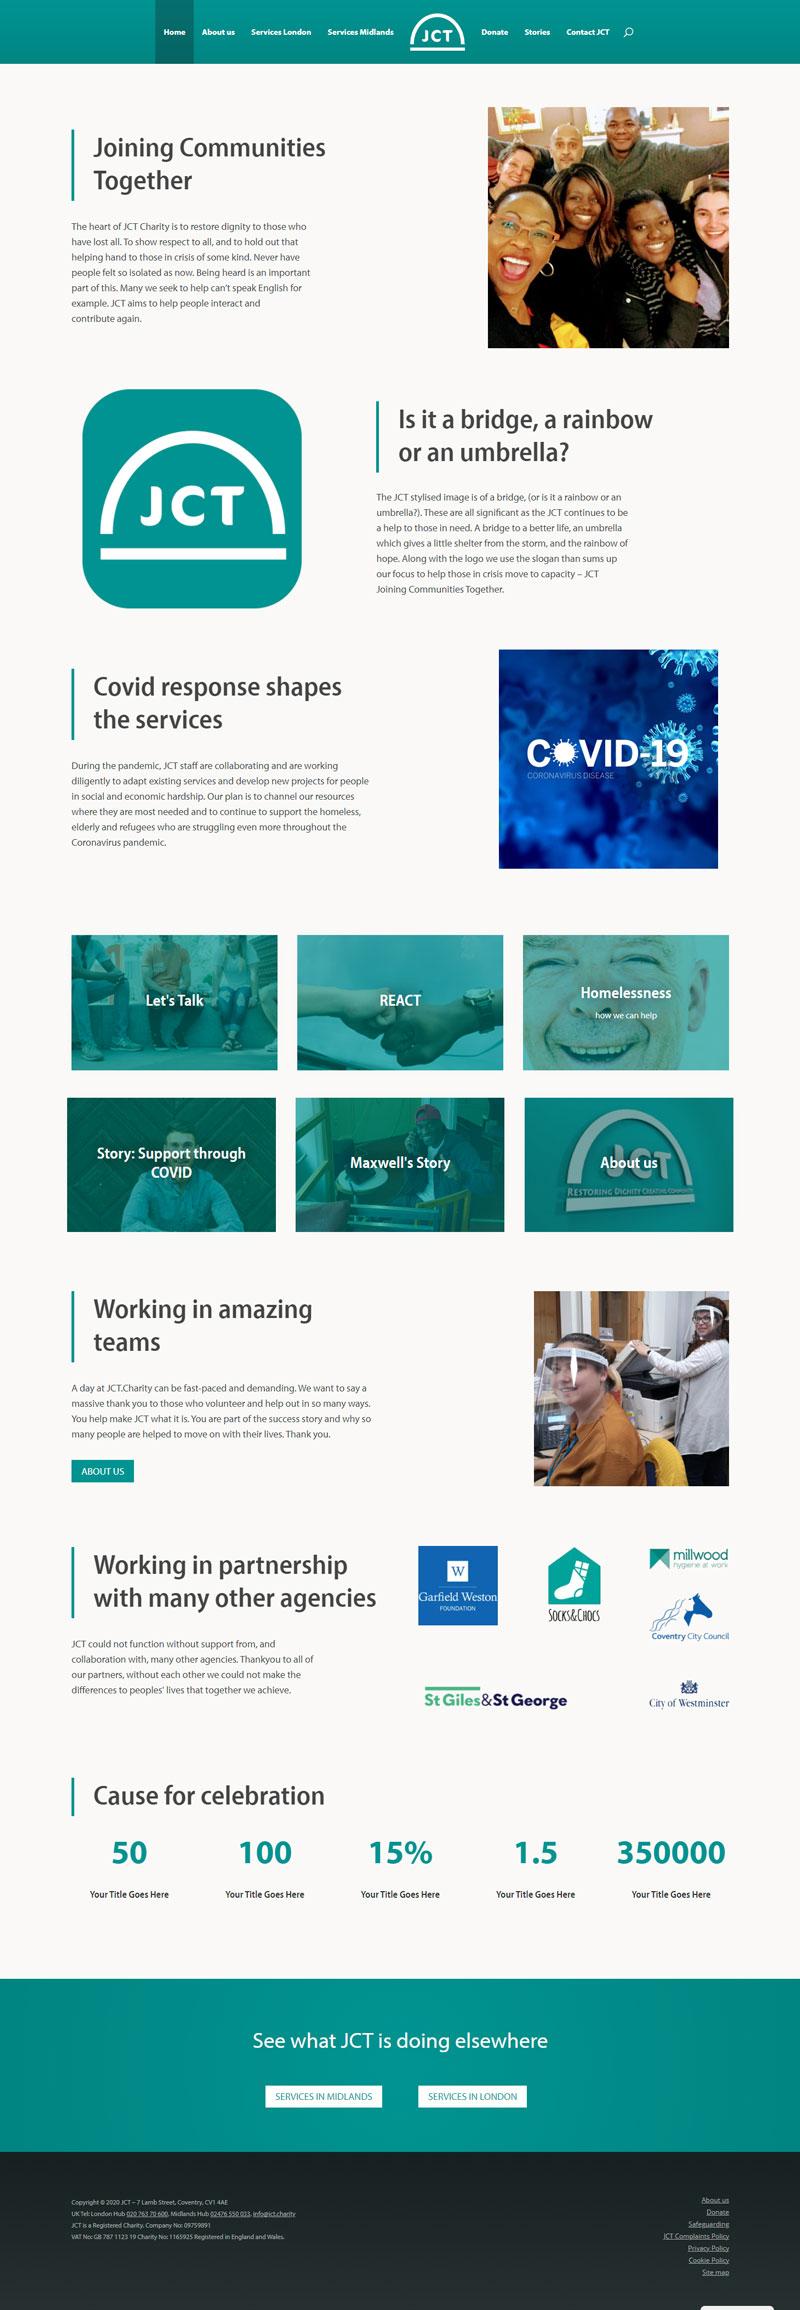 JCT homepage